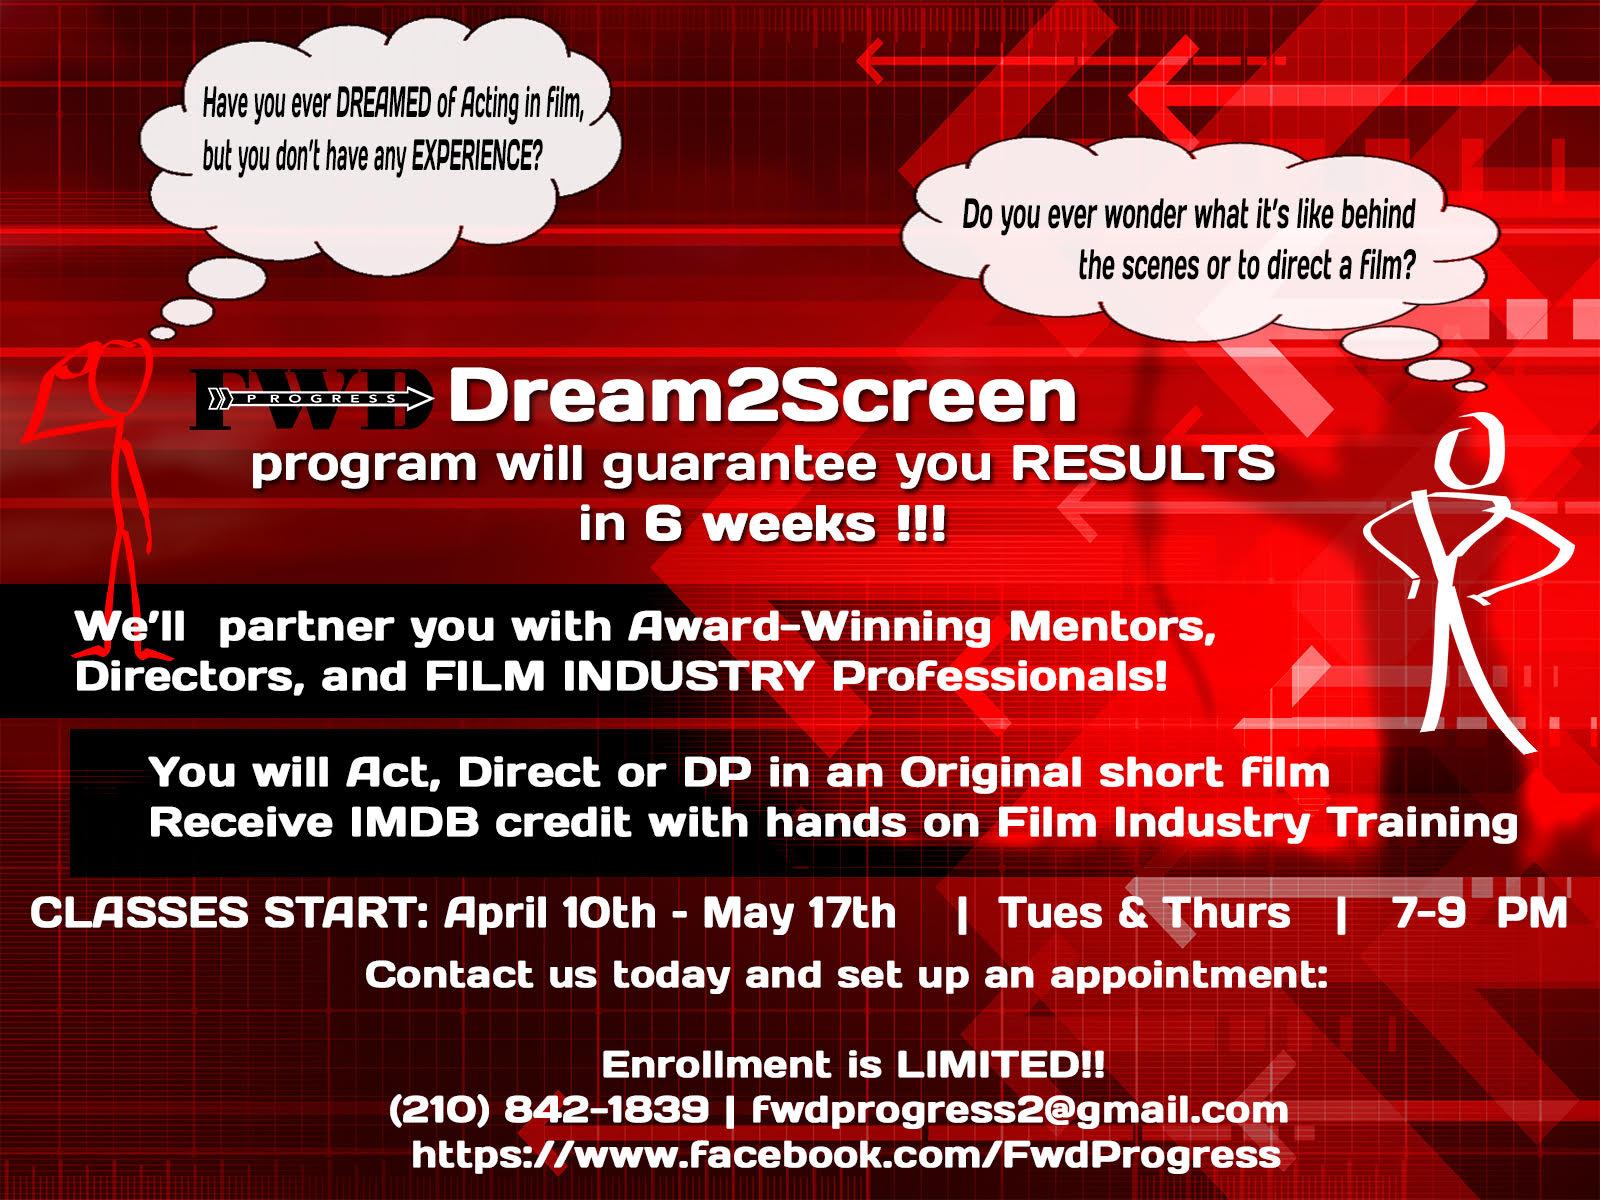 Dream2Screen flyer.jpg